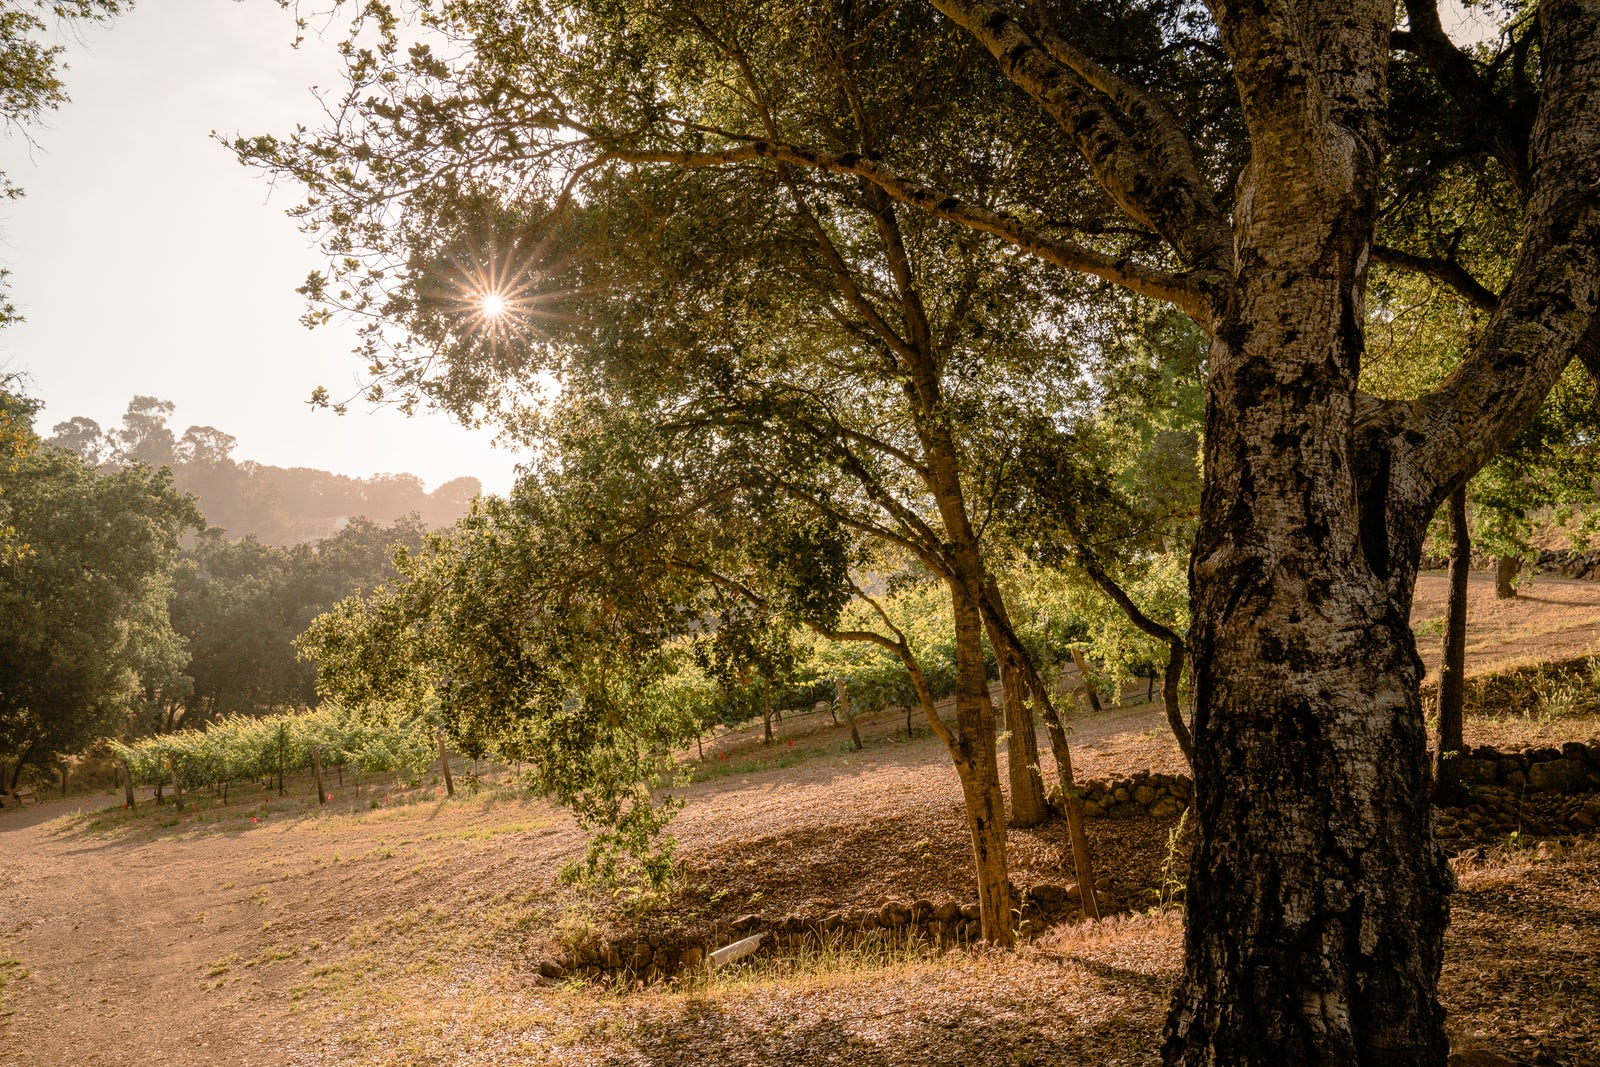 Vineyard and oak trees